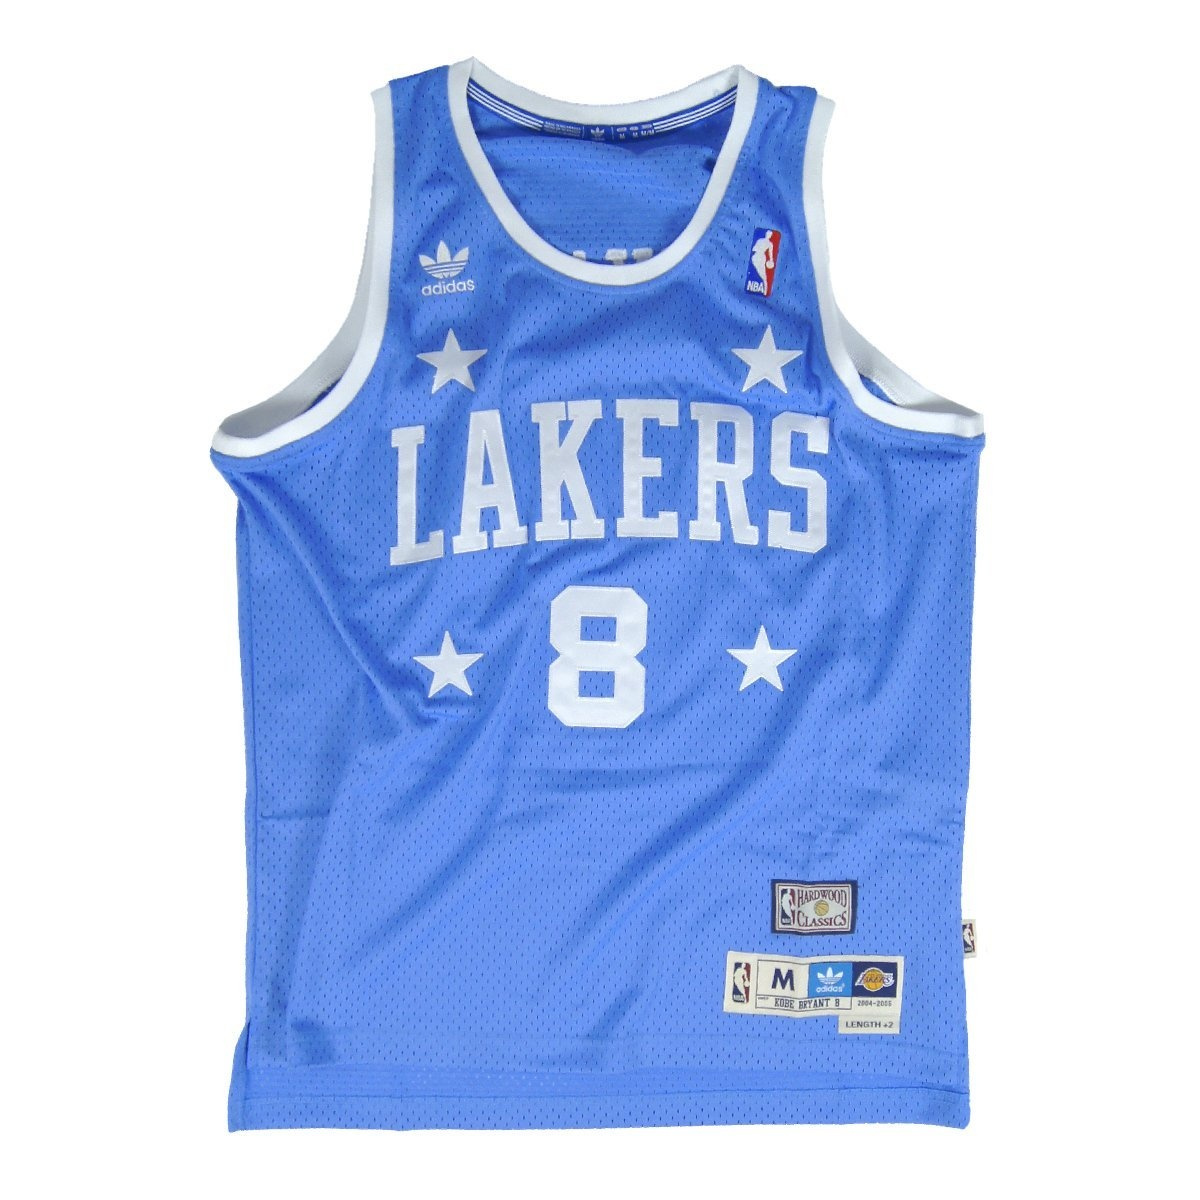 Kobe Bryant Los Angeles Lakers Adidas NBA Throwback Swingman ...